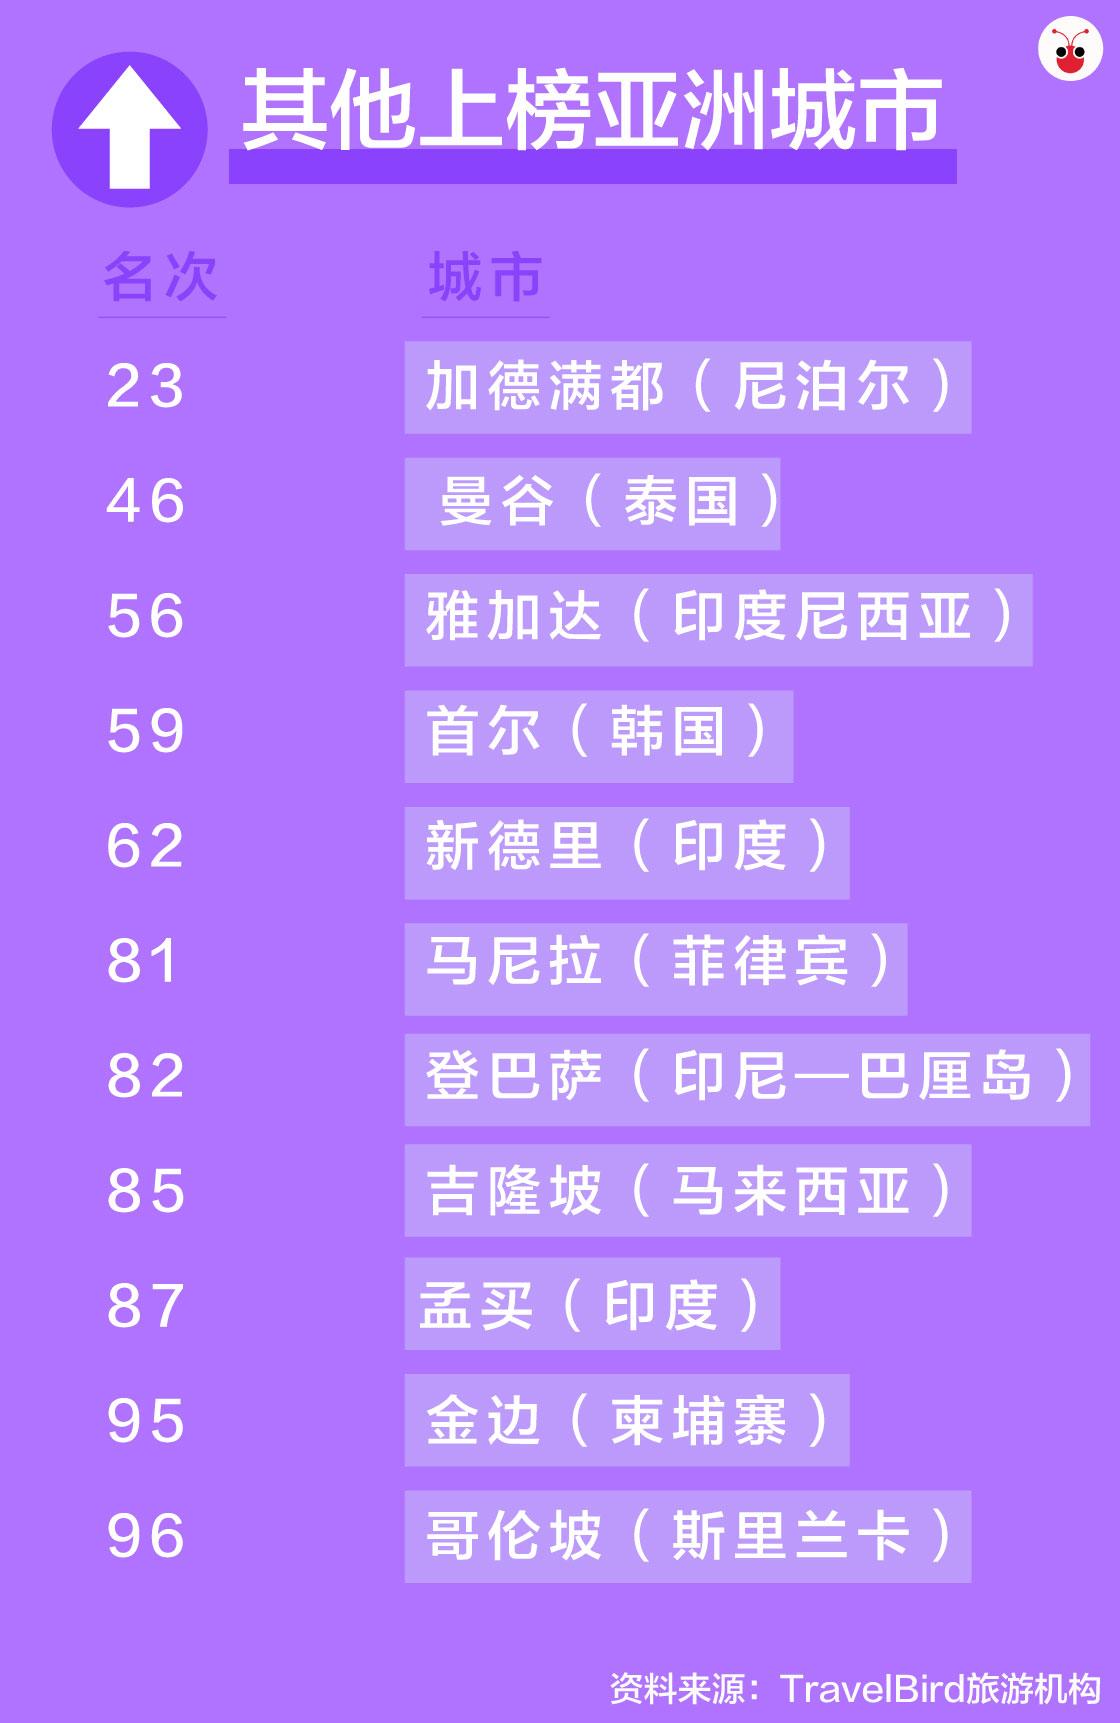 20171122_Asian countries ranking.jpg